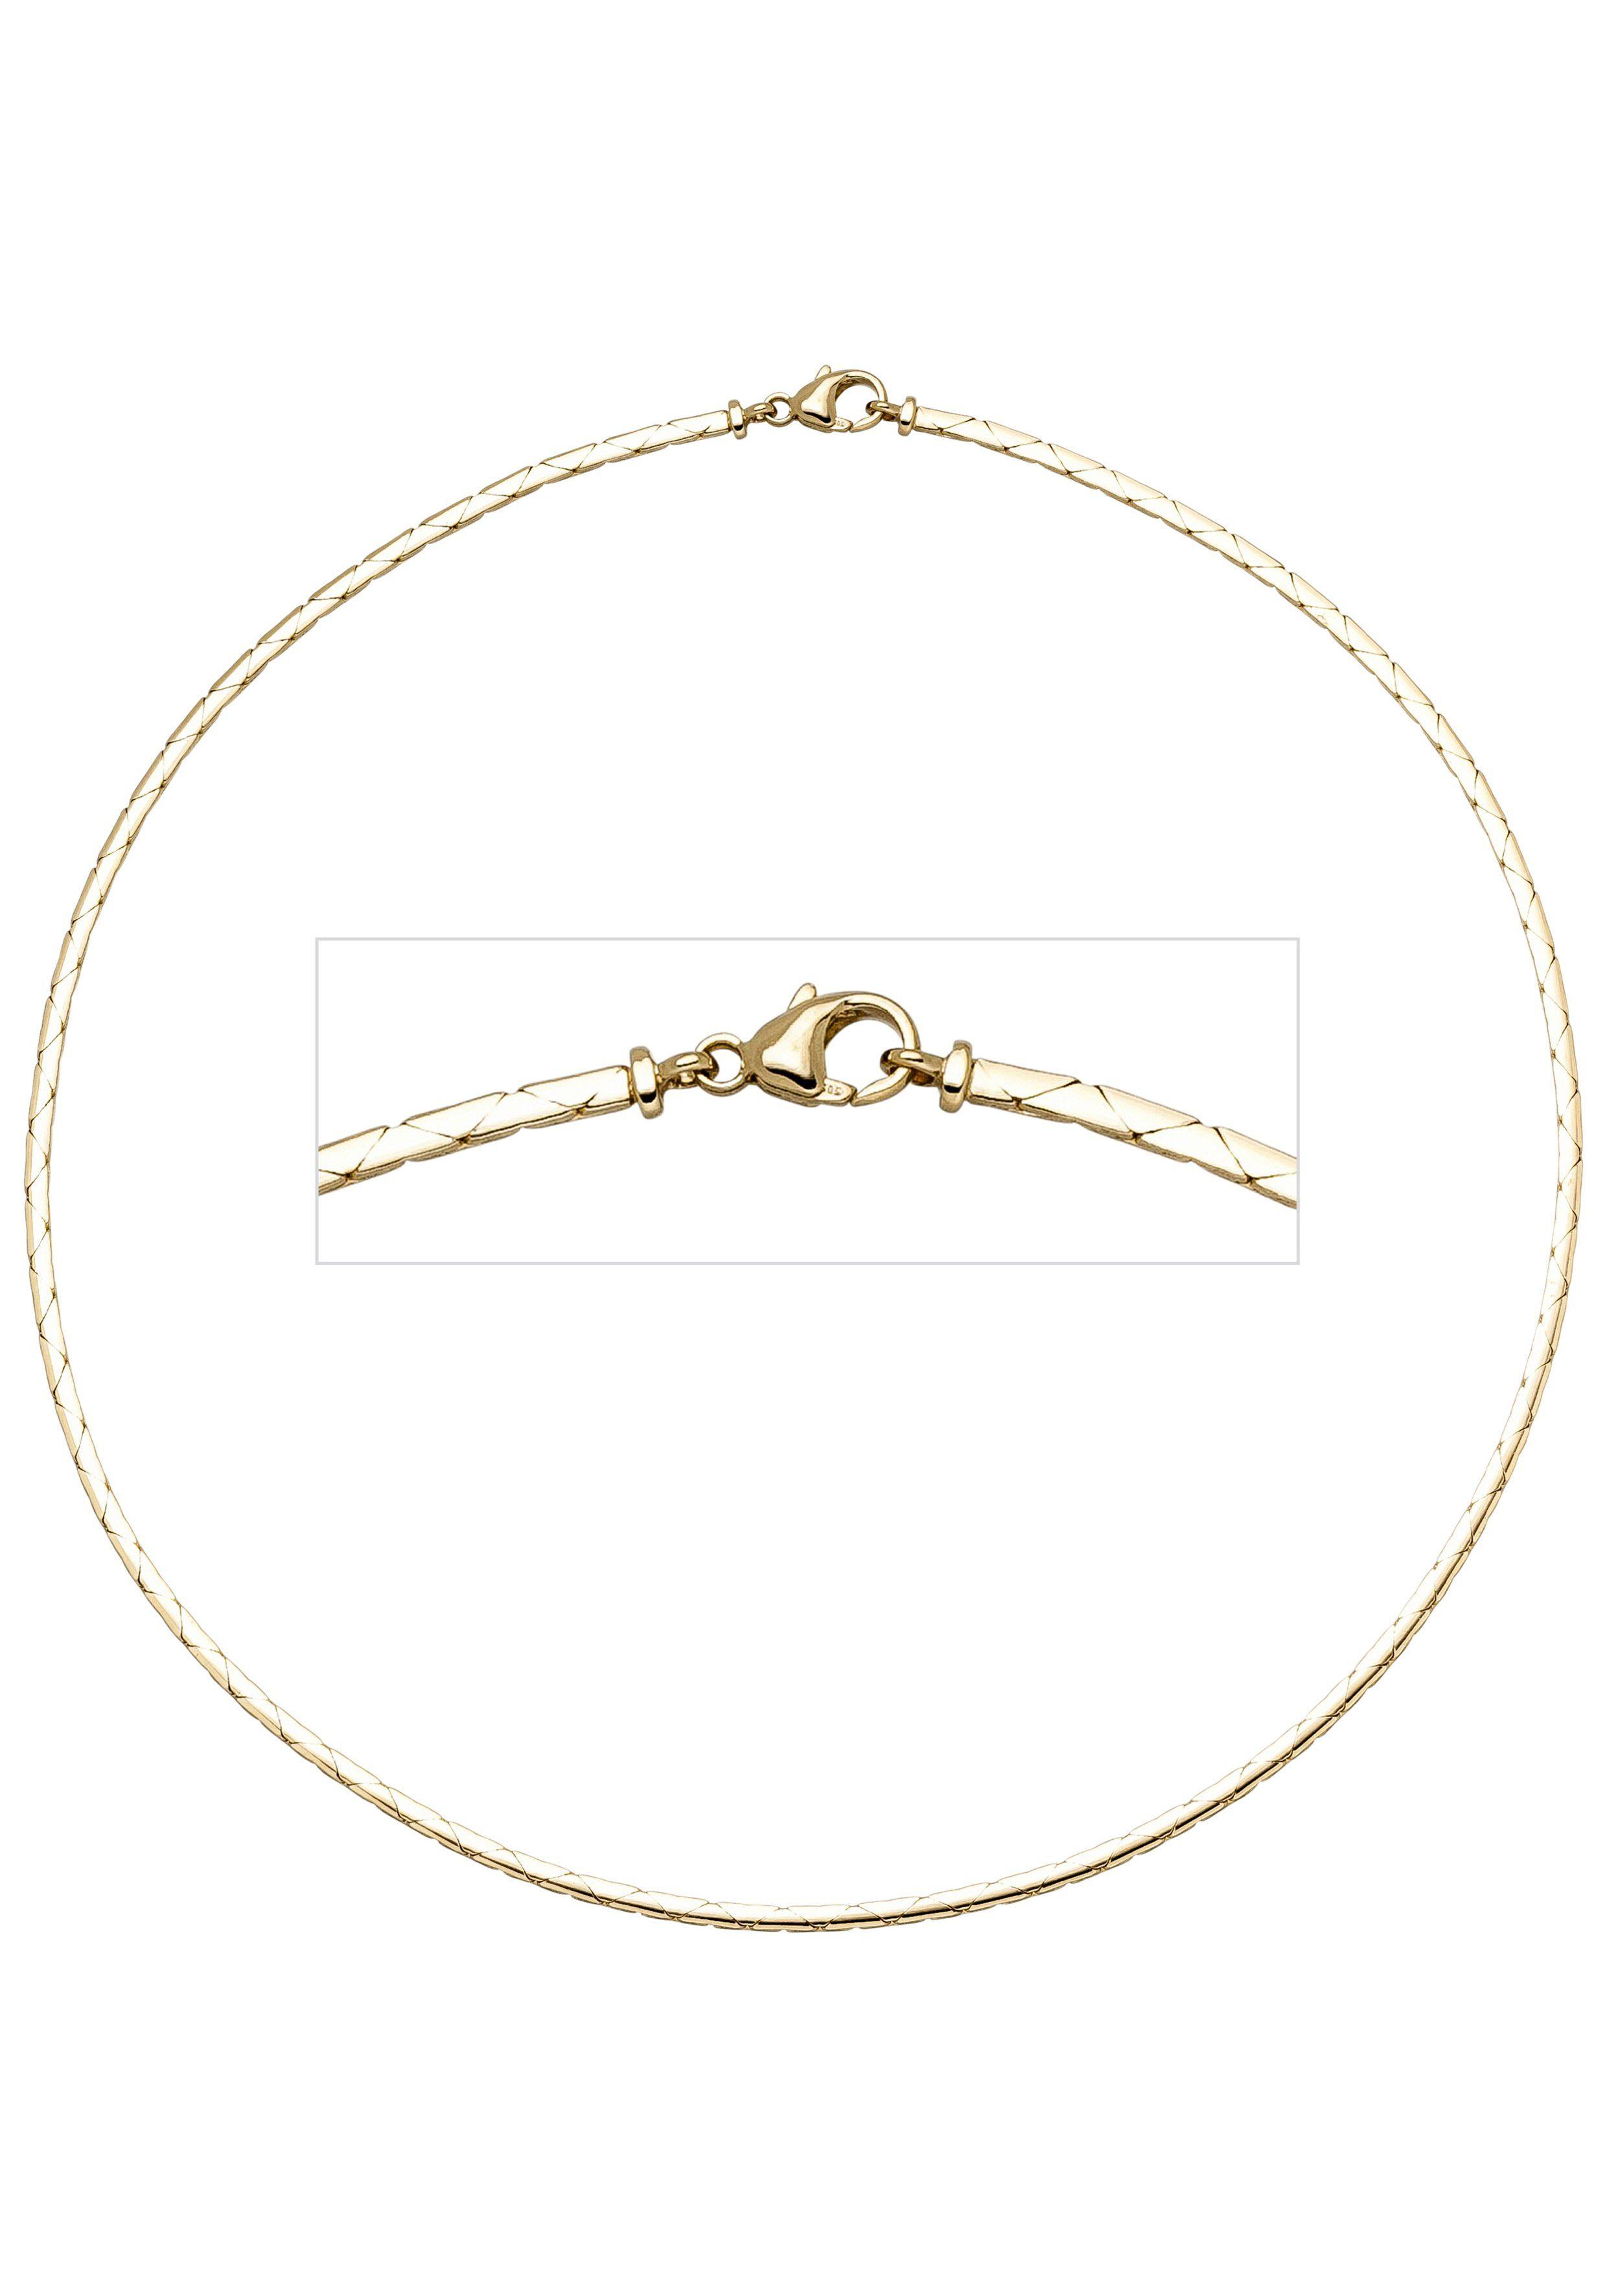 JOBO Goldkette 585 Gold 42 cm